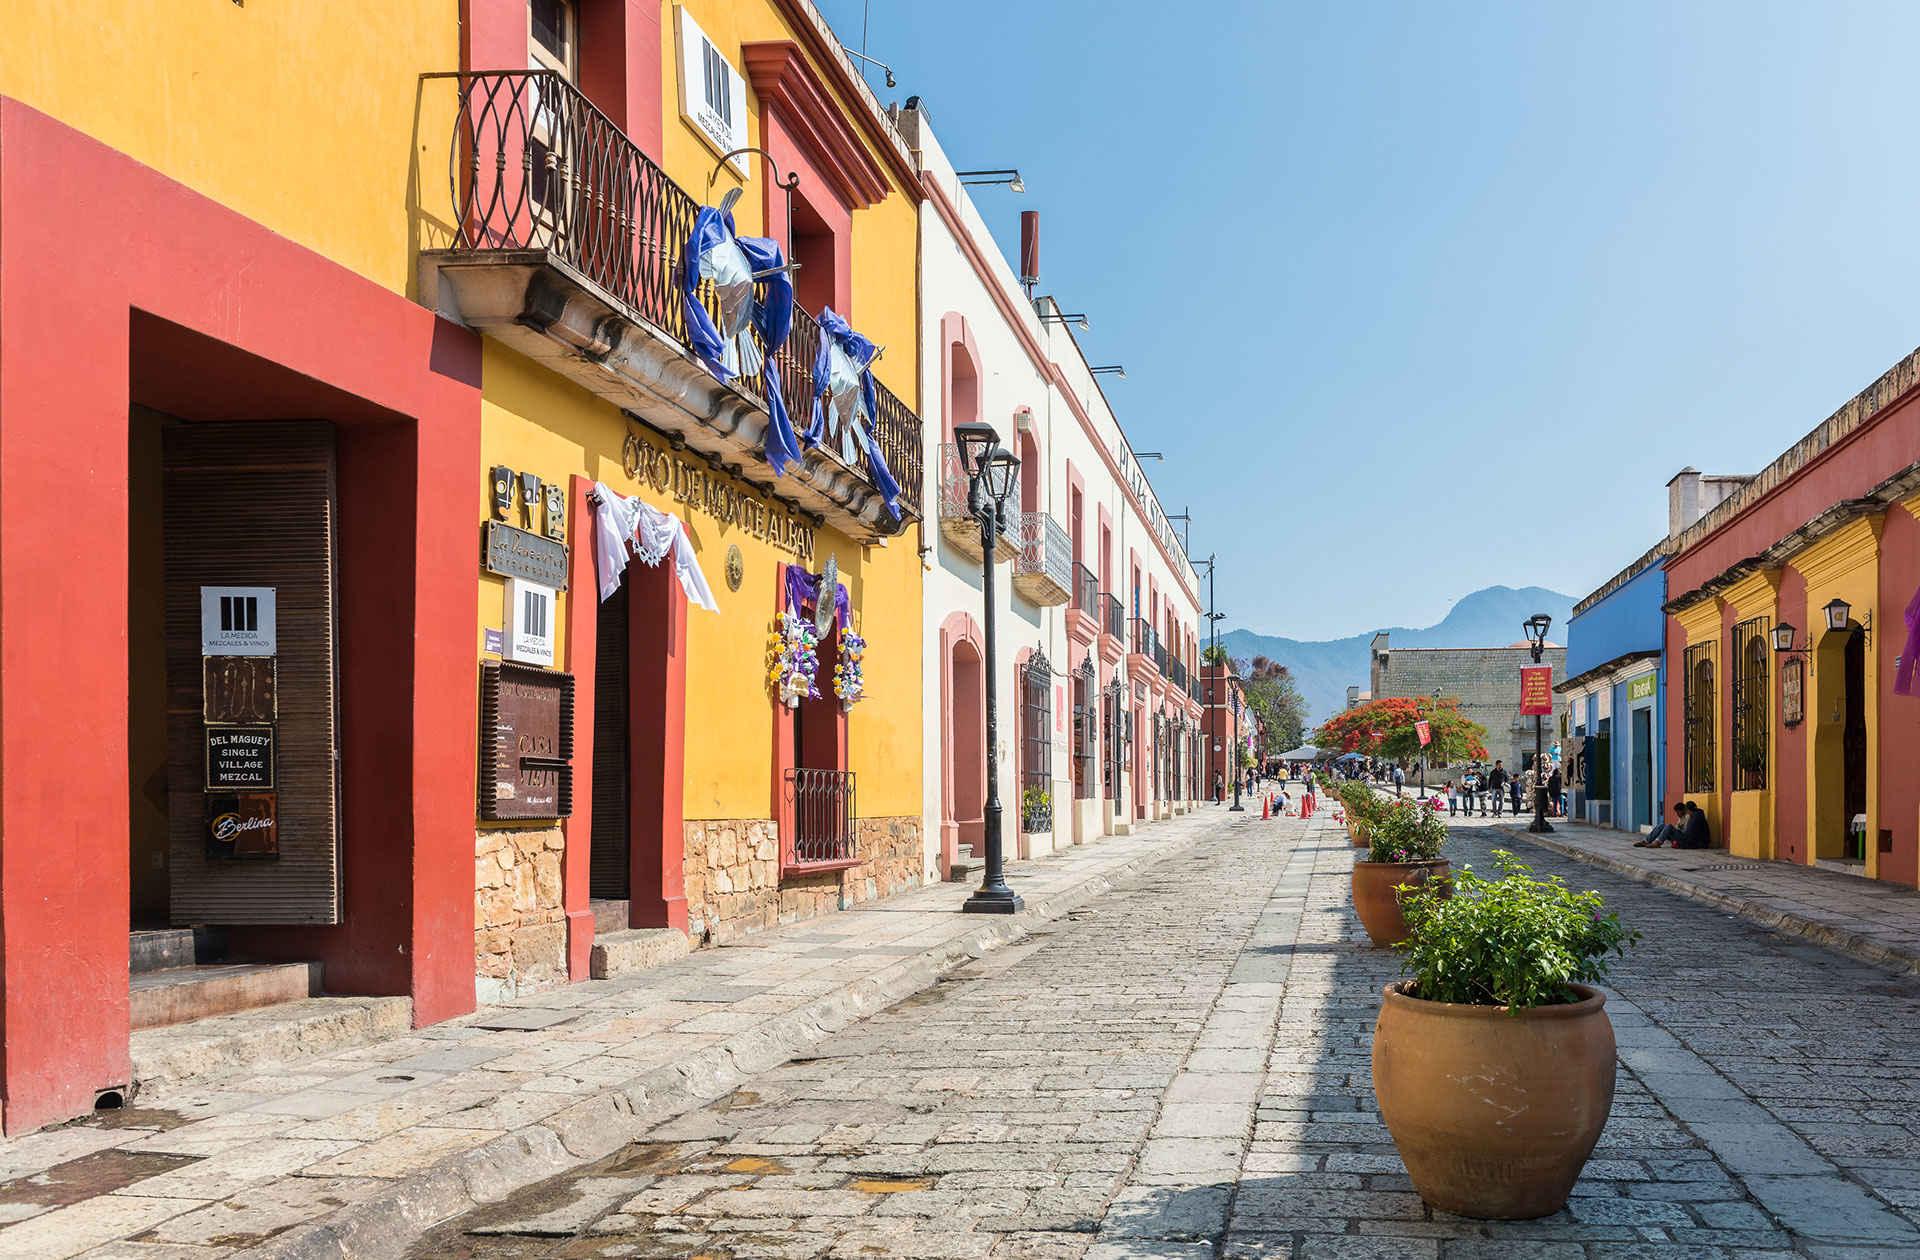 Street scene in Oaxaca; Photo Courtesy of Angelina Pilarinos /Shutterstock.com